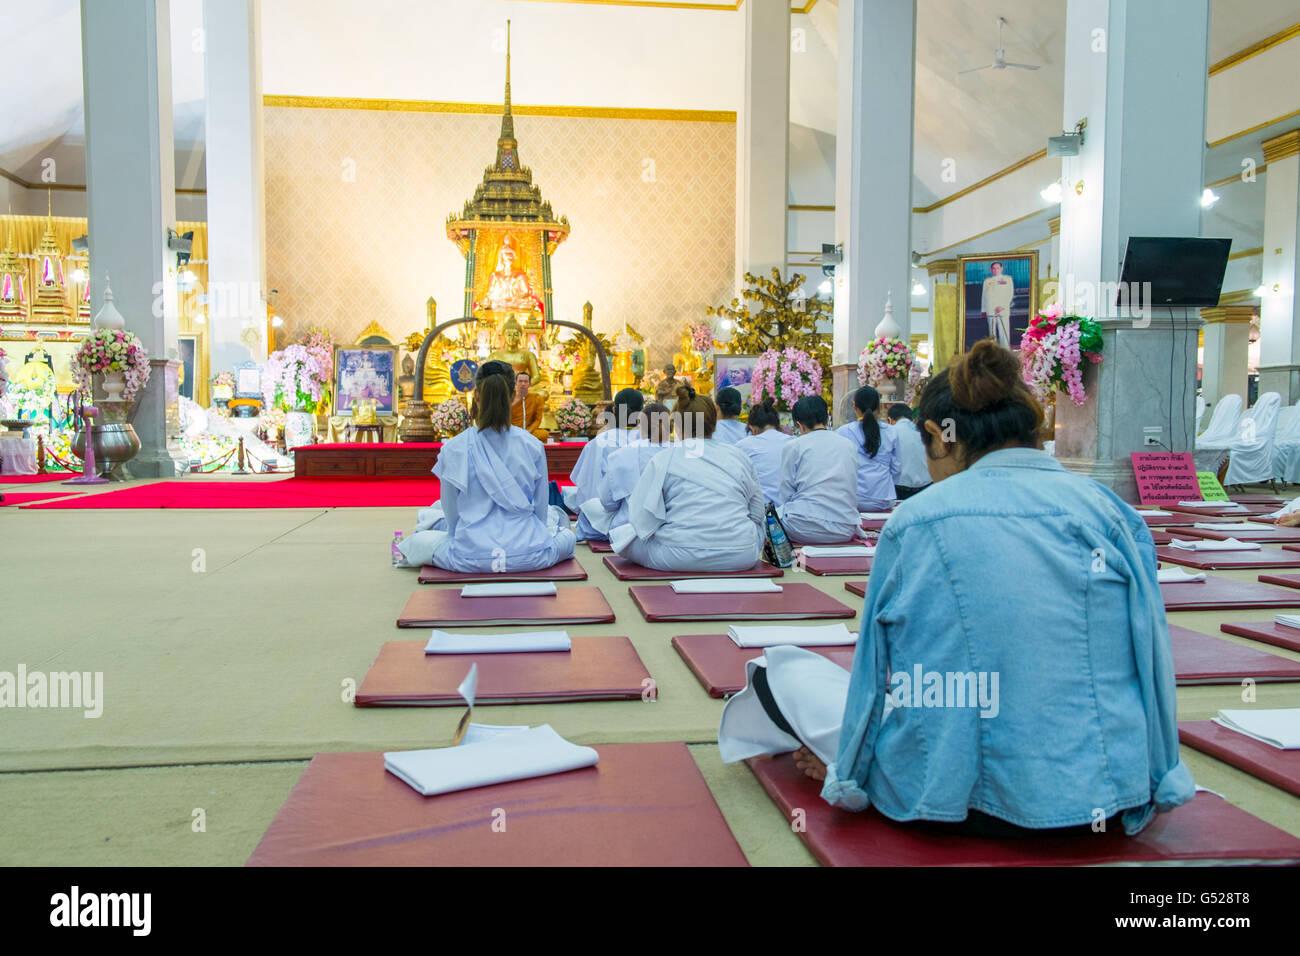 Vipassana meditation classes in Wat Pathumwanaram Ratchaworawihan temple - Stock Image